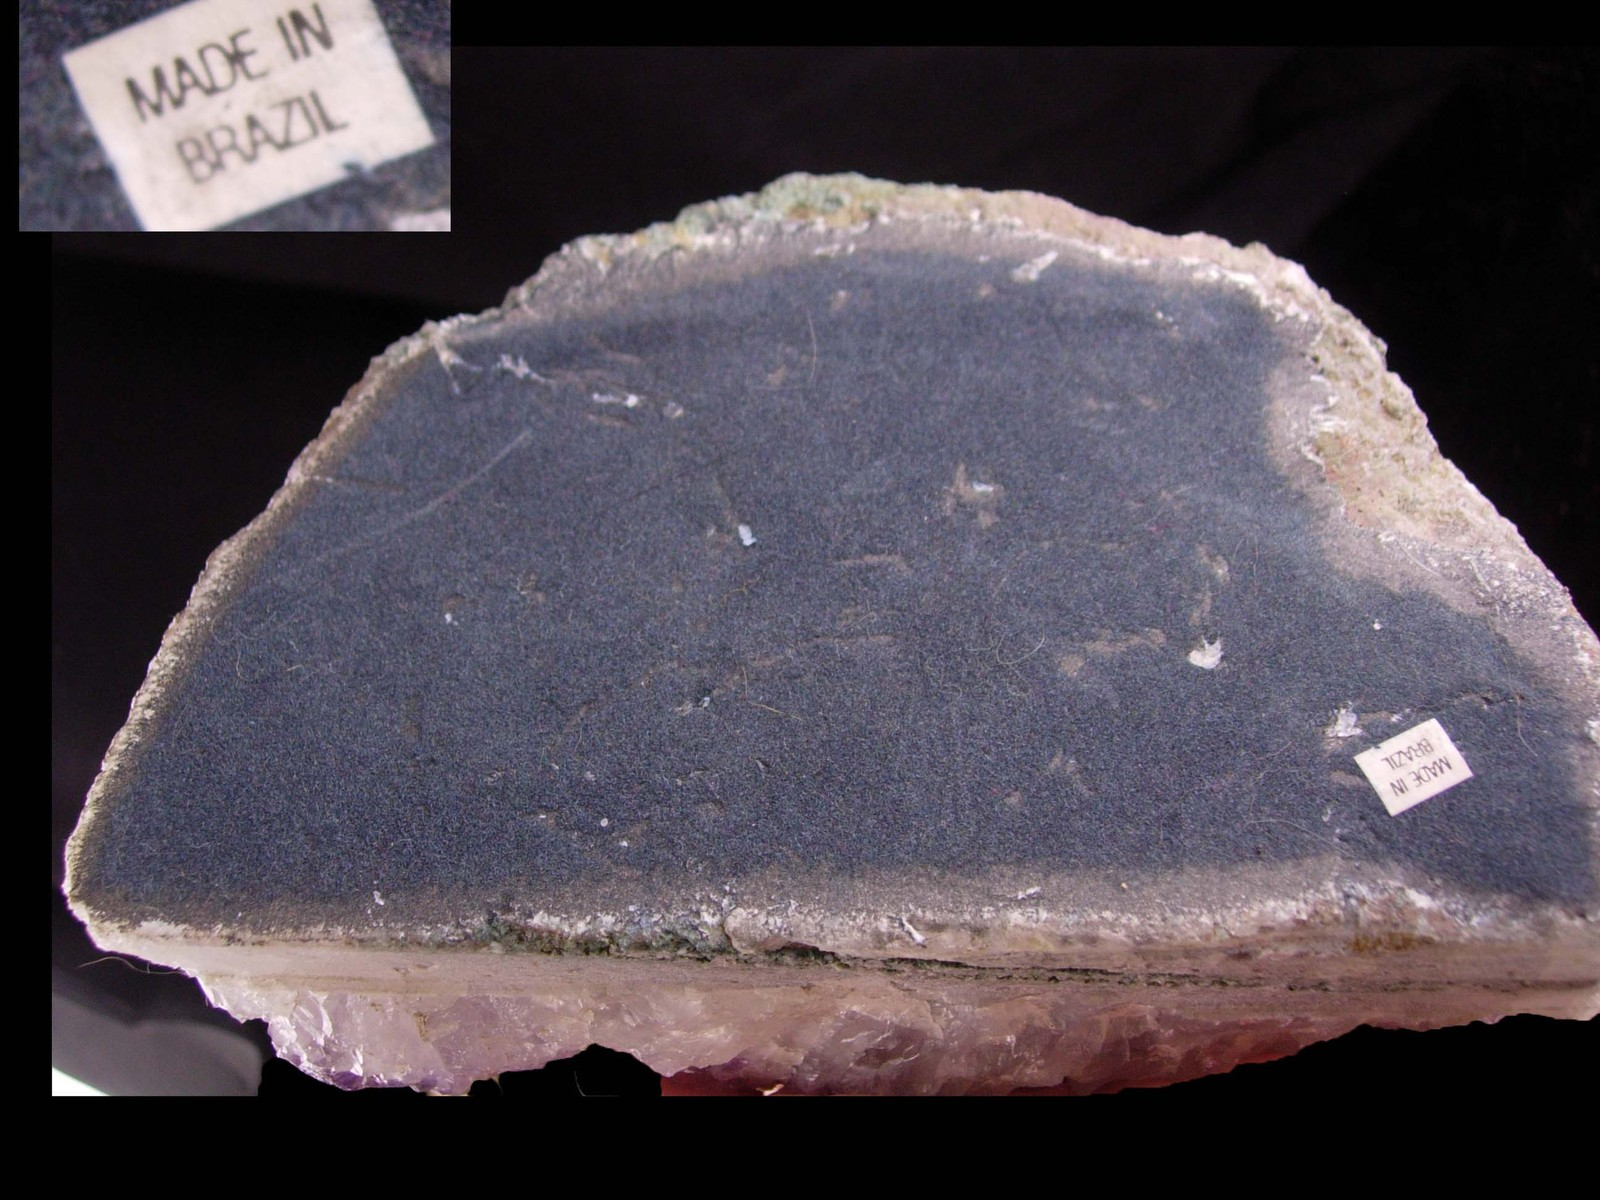 Large Brazil Amethyst Candle holder - february birthstone Aquarius gift - purple